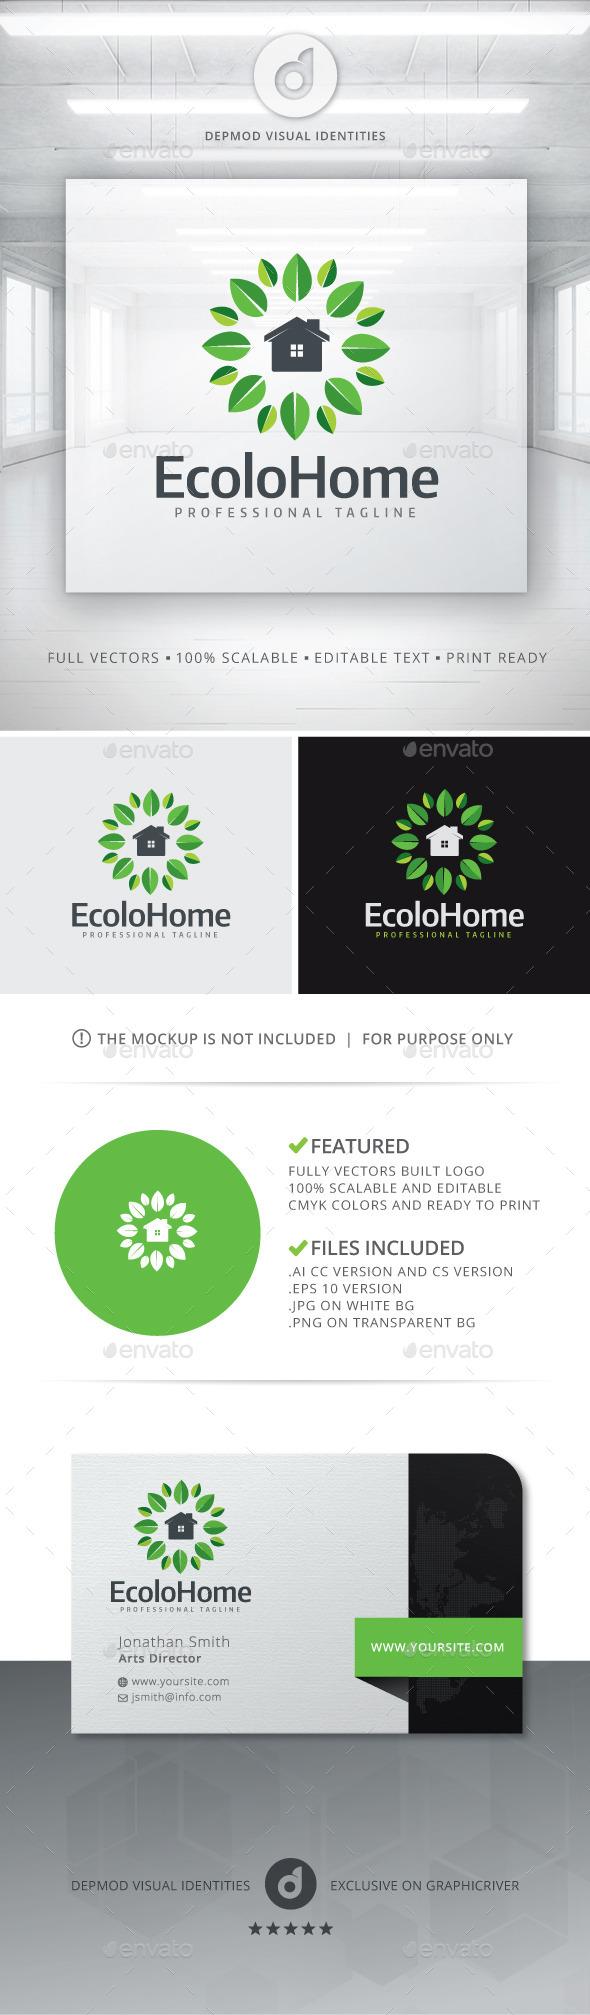 GraphicRiver Ecolo Home Logo 11352325